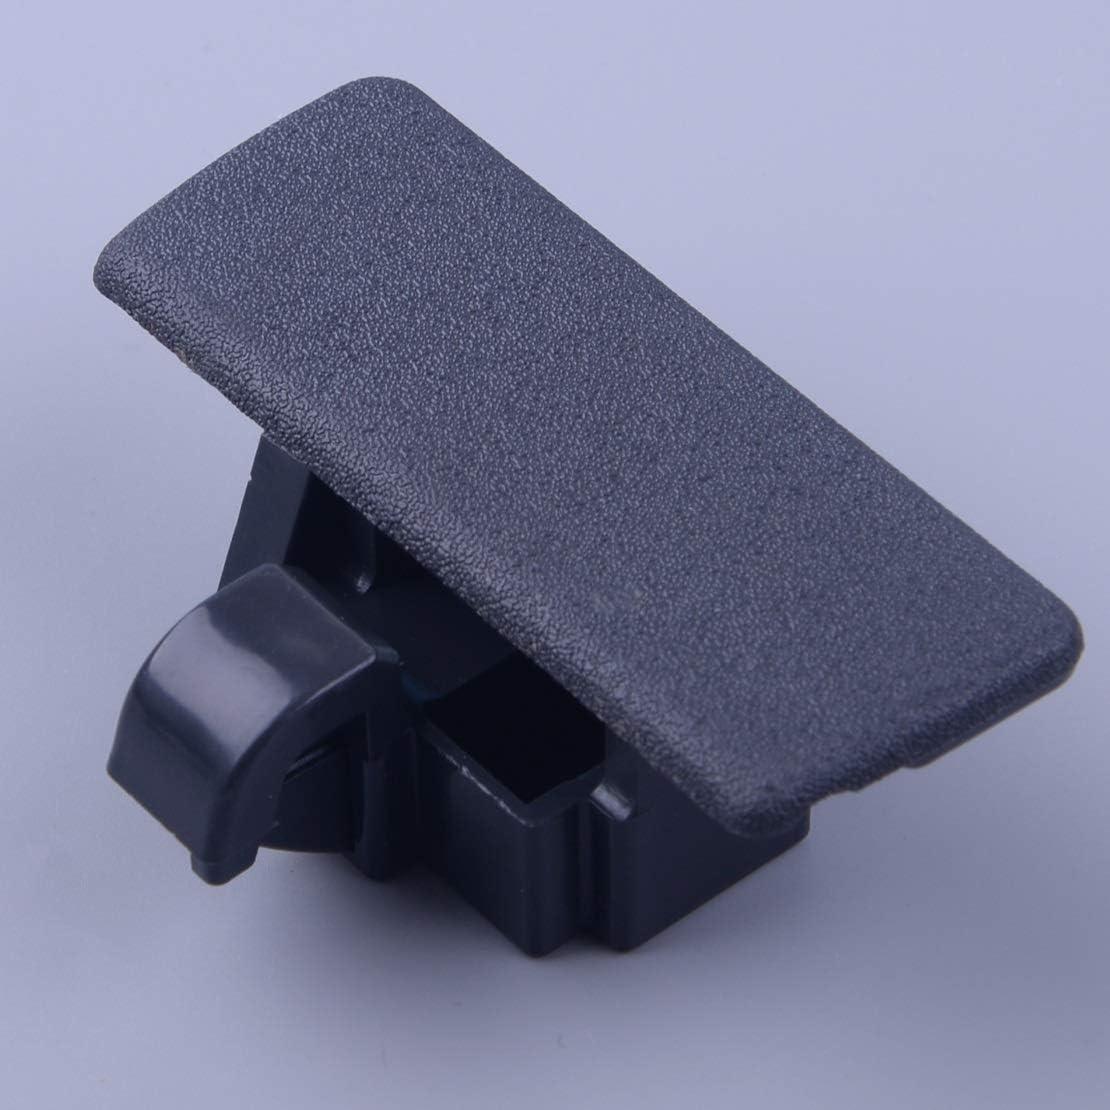 TAYDMEO Coche Negro de pl/ástico Interna de Almacenamiento guantera Tapa del Compartimiento de Bloqueo de la Tapa de la manija//Ajuste for Suzuki SX4 Swift Car Styling